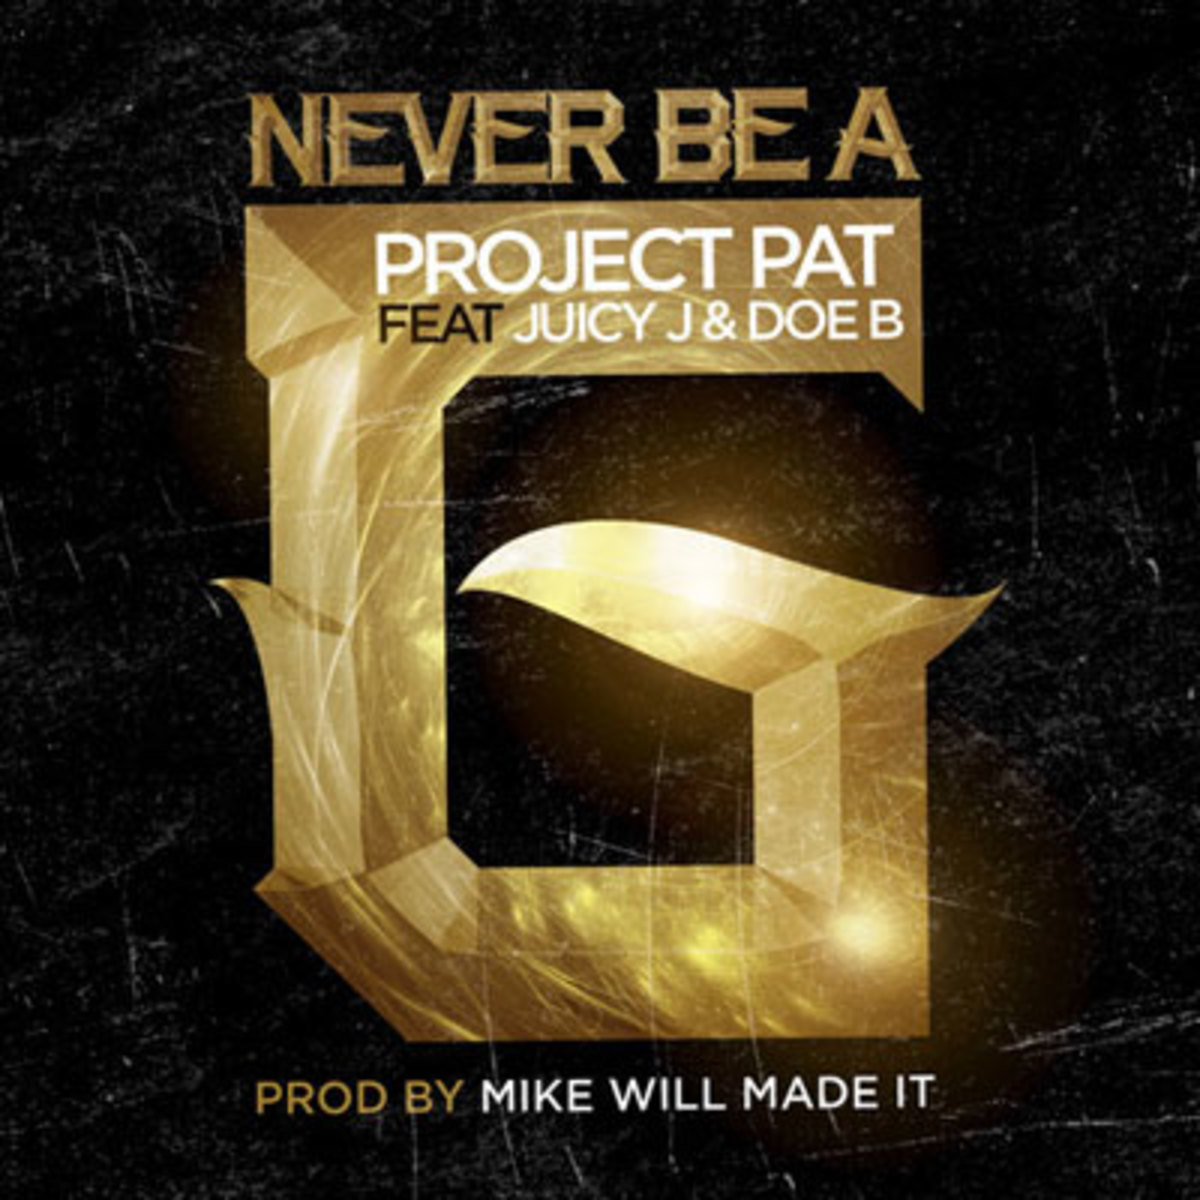 projectpat-neverbeag.jpg